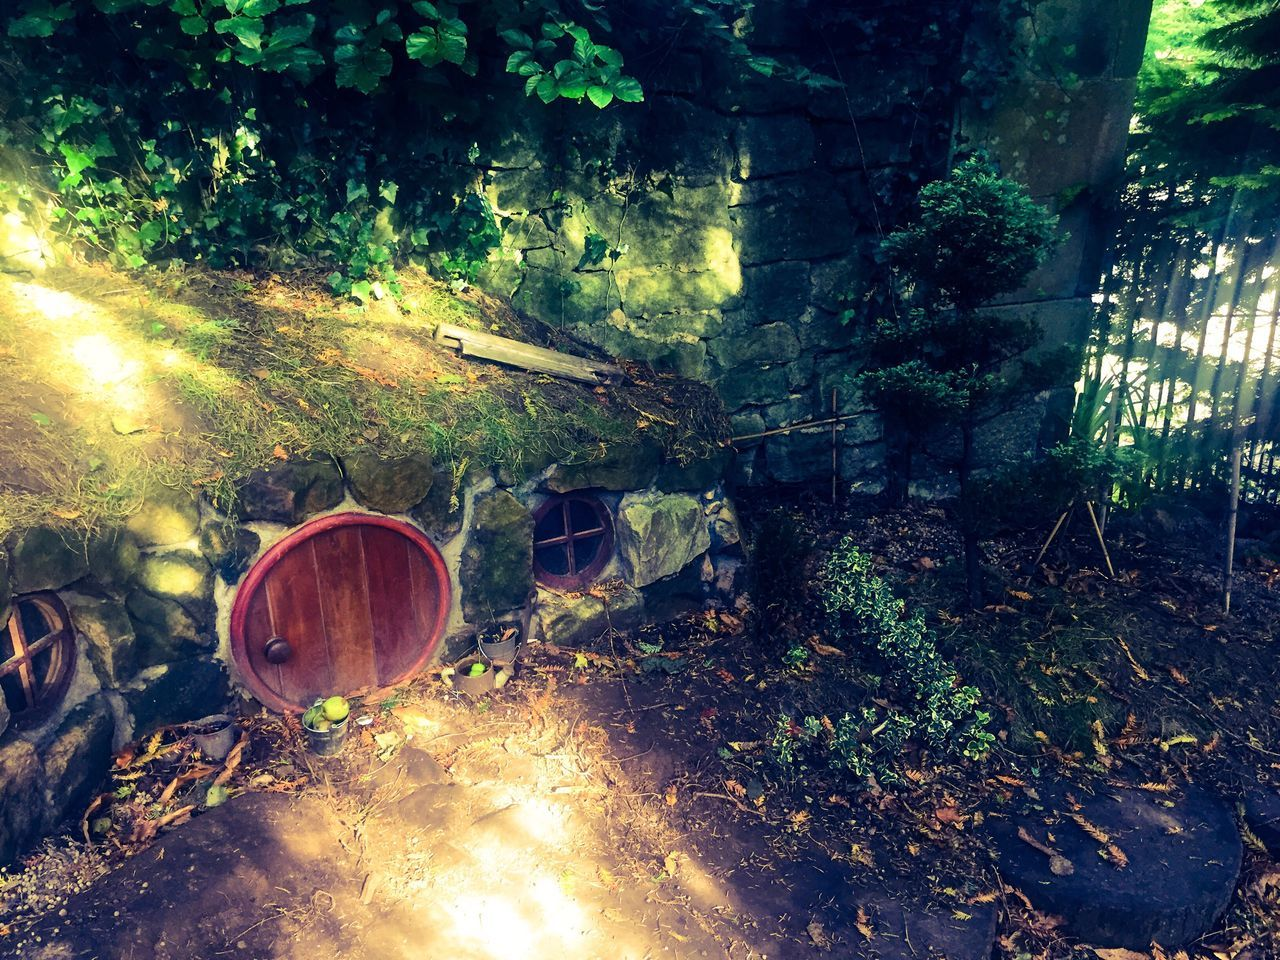 Fairy House Summer #summertime #sun #TagsForLikes.com #hot #sunny #warm #fun #beautiful #sky #clearskys #season #seasons #instagood #instasummer #photooftheday #nature #TFLers #clearsky #bluesky #vacationtime #weather #summerweather #sunshine #summertimeshine